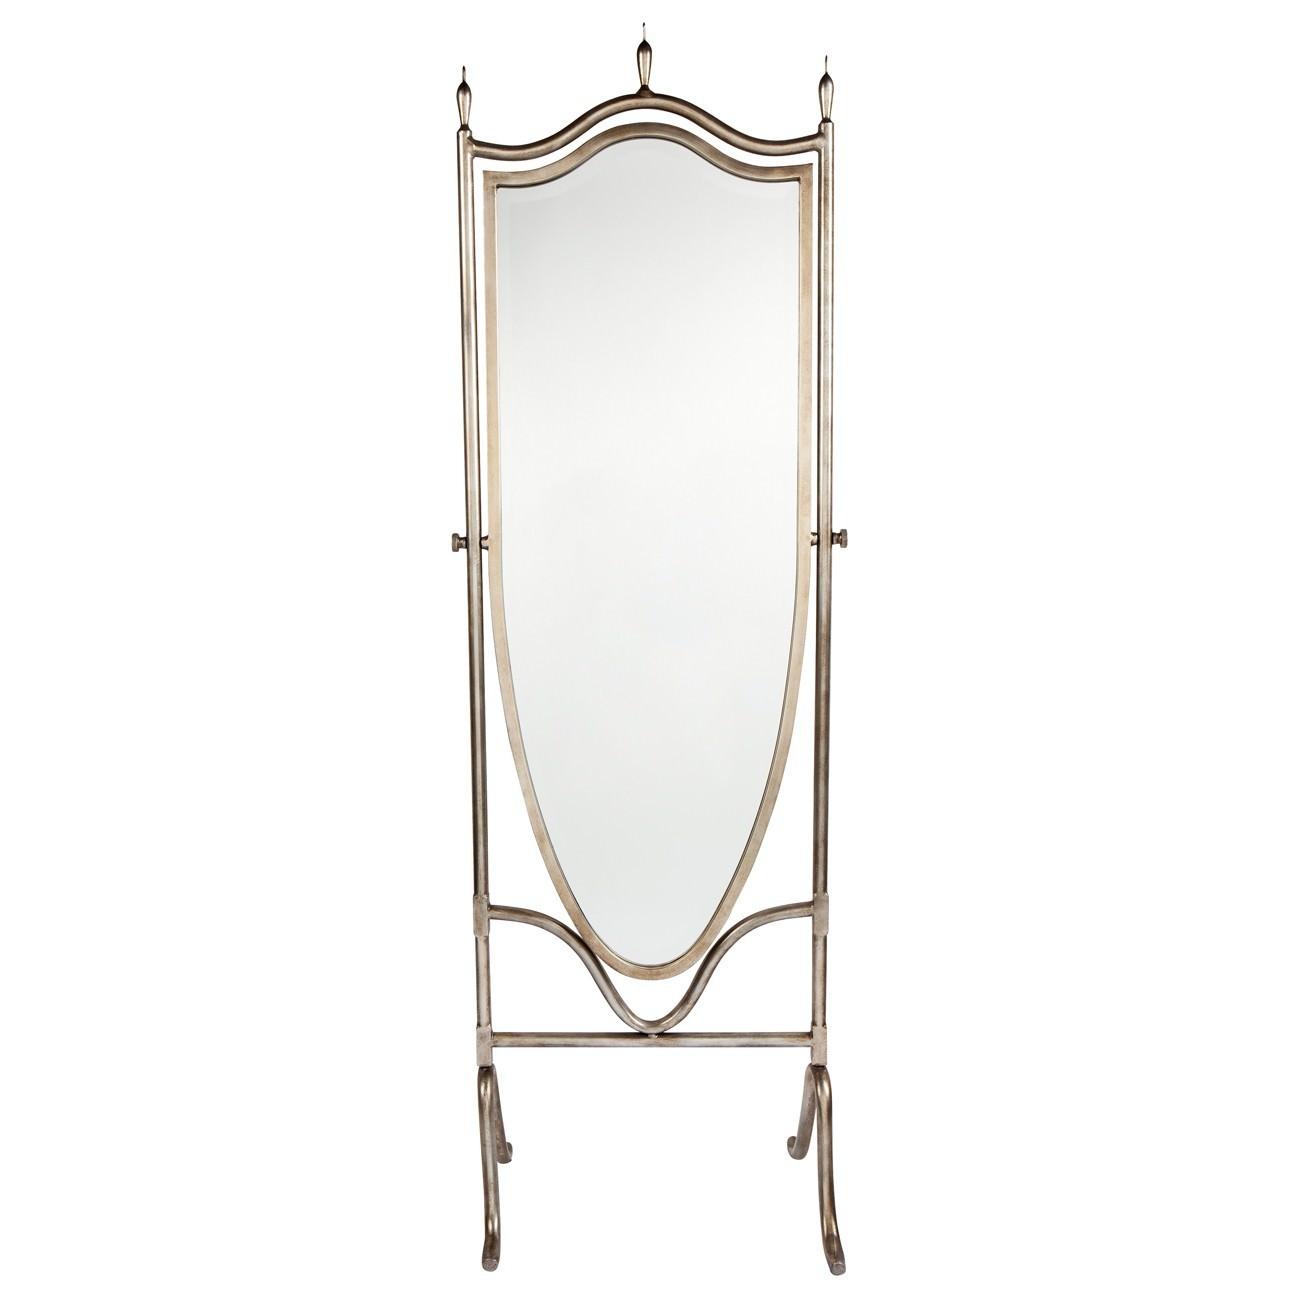 Lillian Metal Frame Cheval Mirror, 189cm